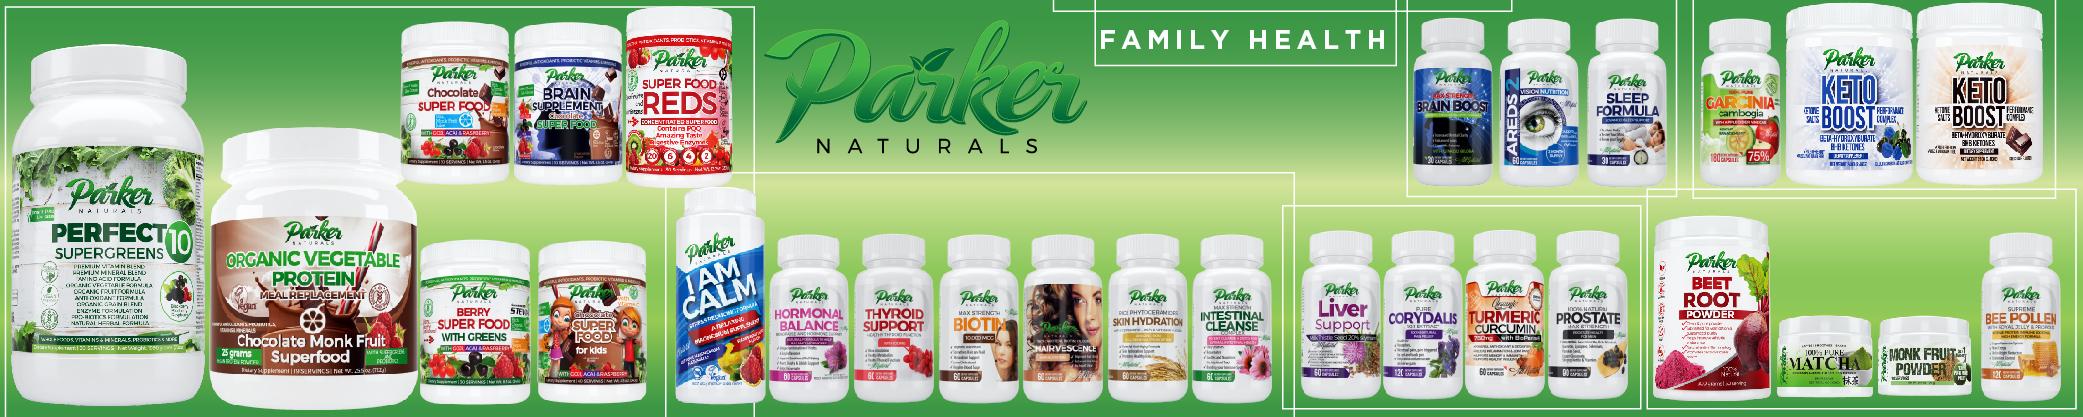 Parker naturals set2 03 4